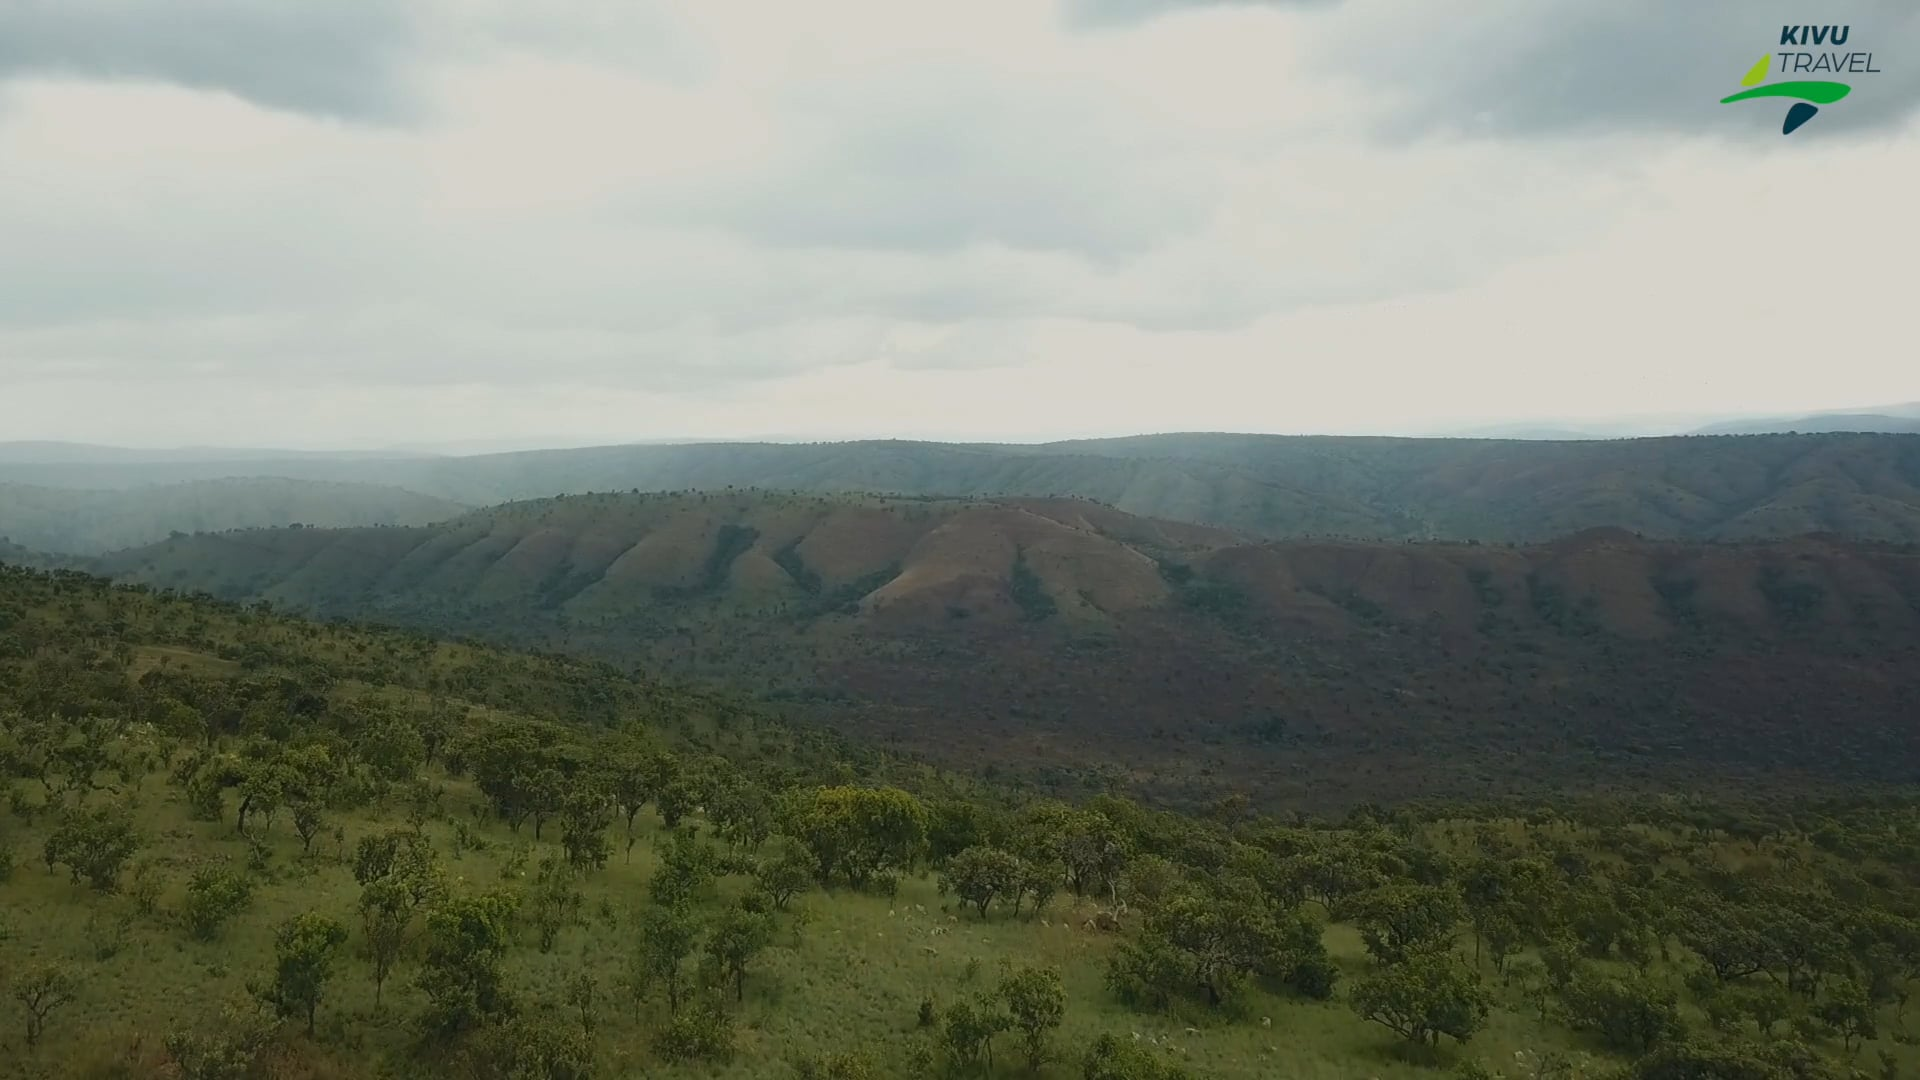 Akagera National Park I Kivu Travel